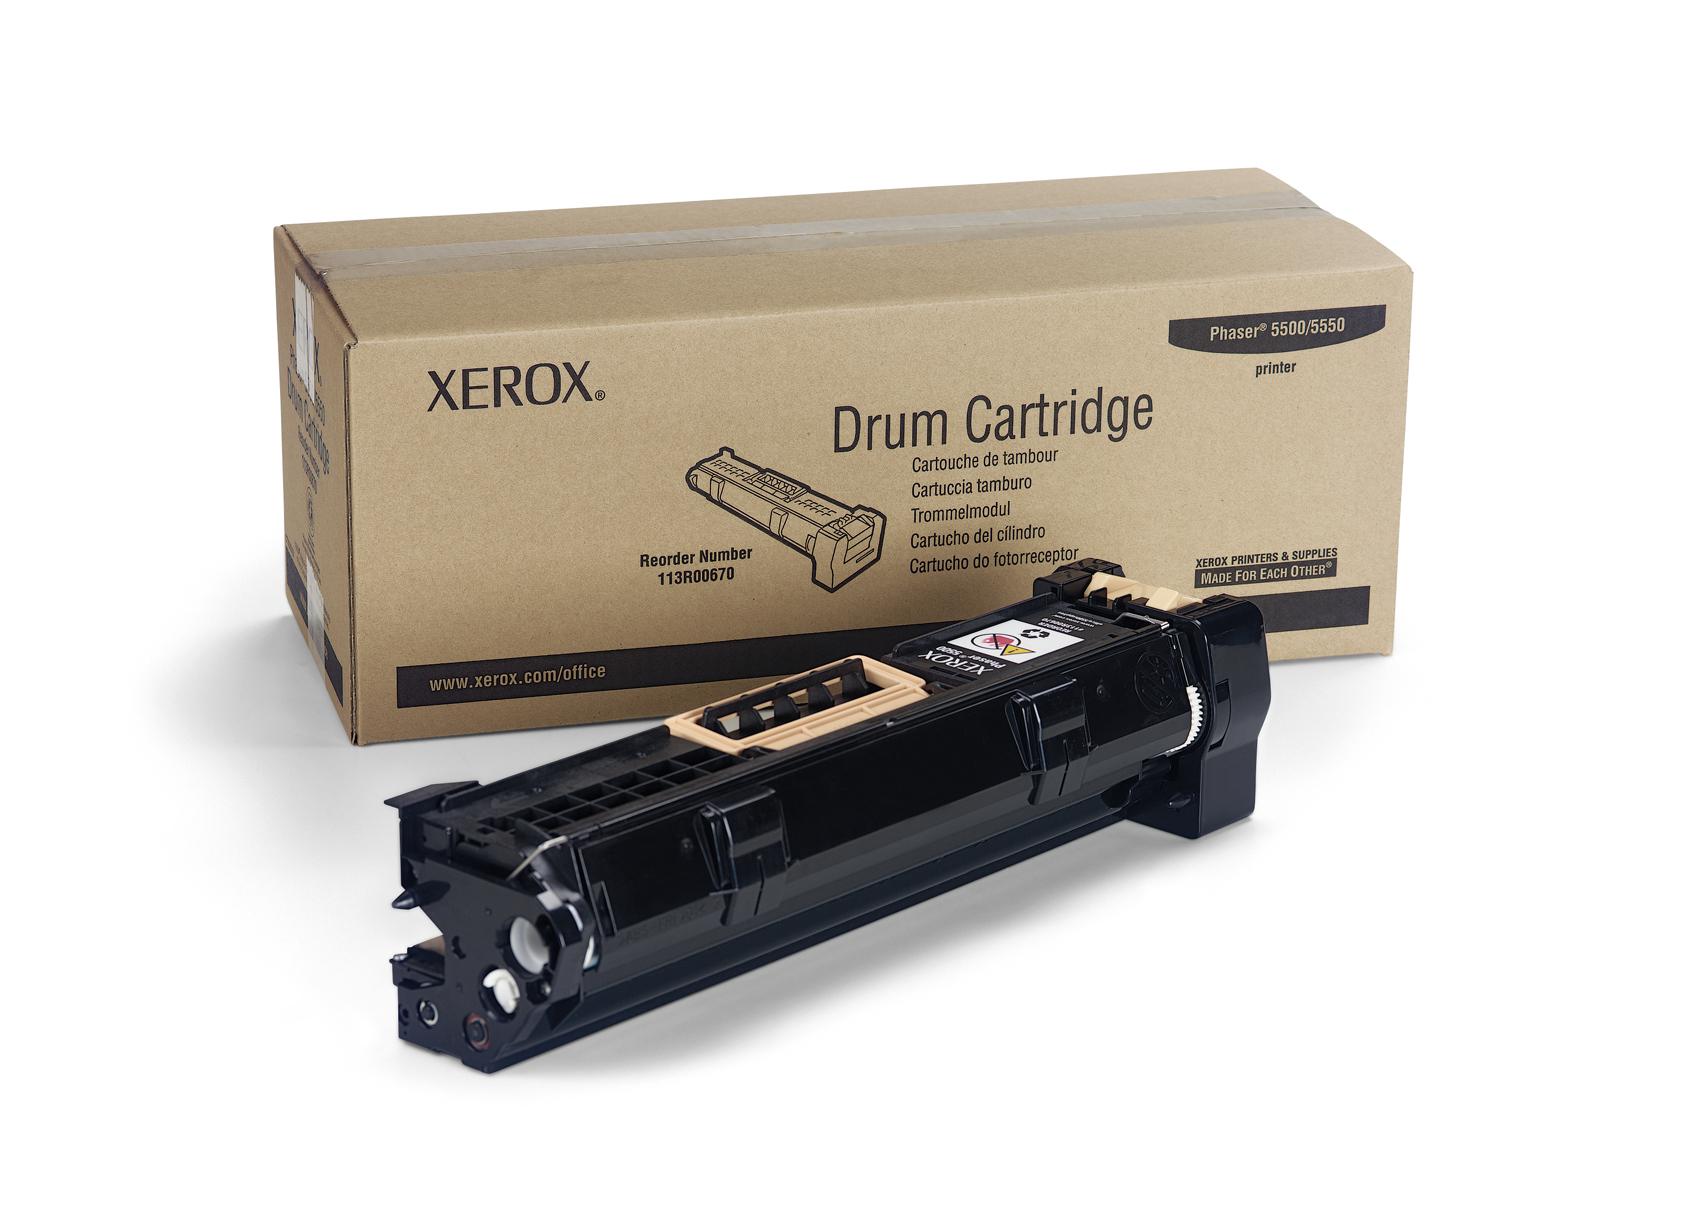 Xerox Cartucho de tambor Phaser 5500/5550